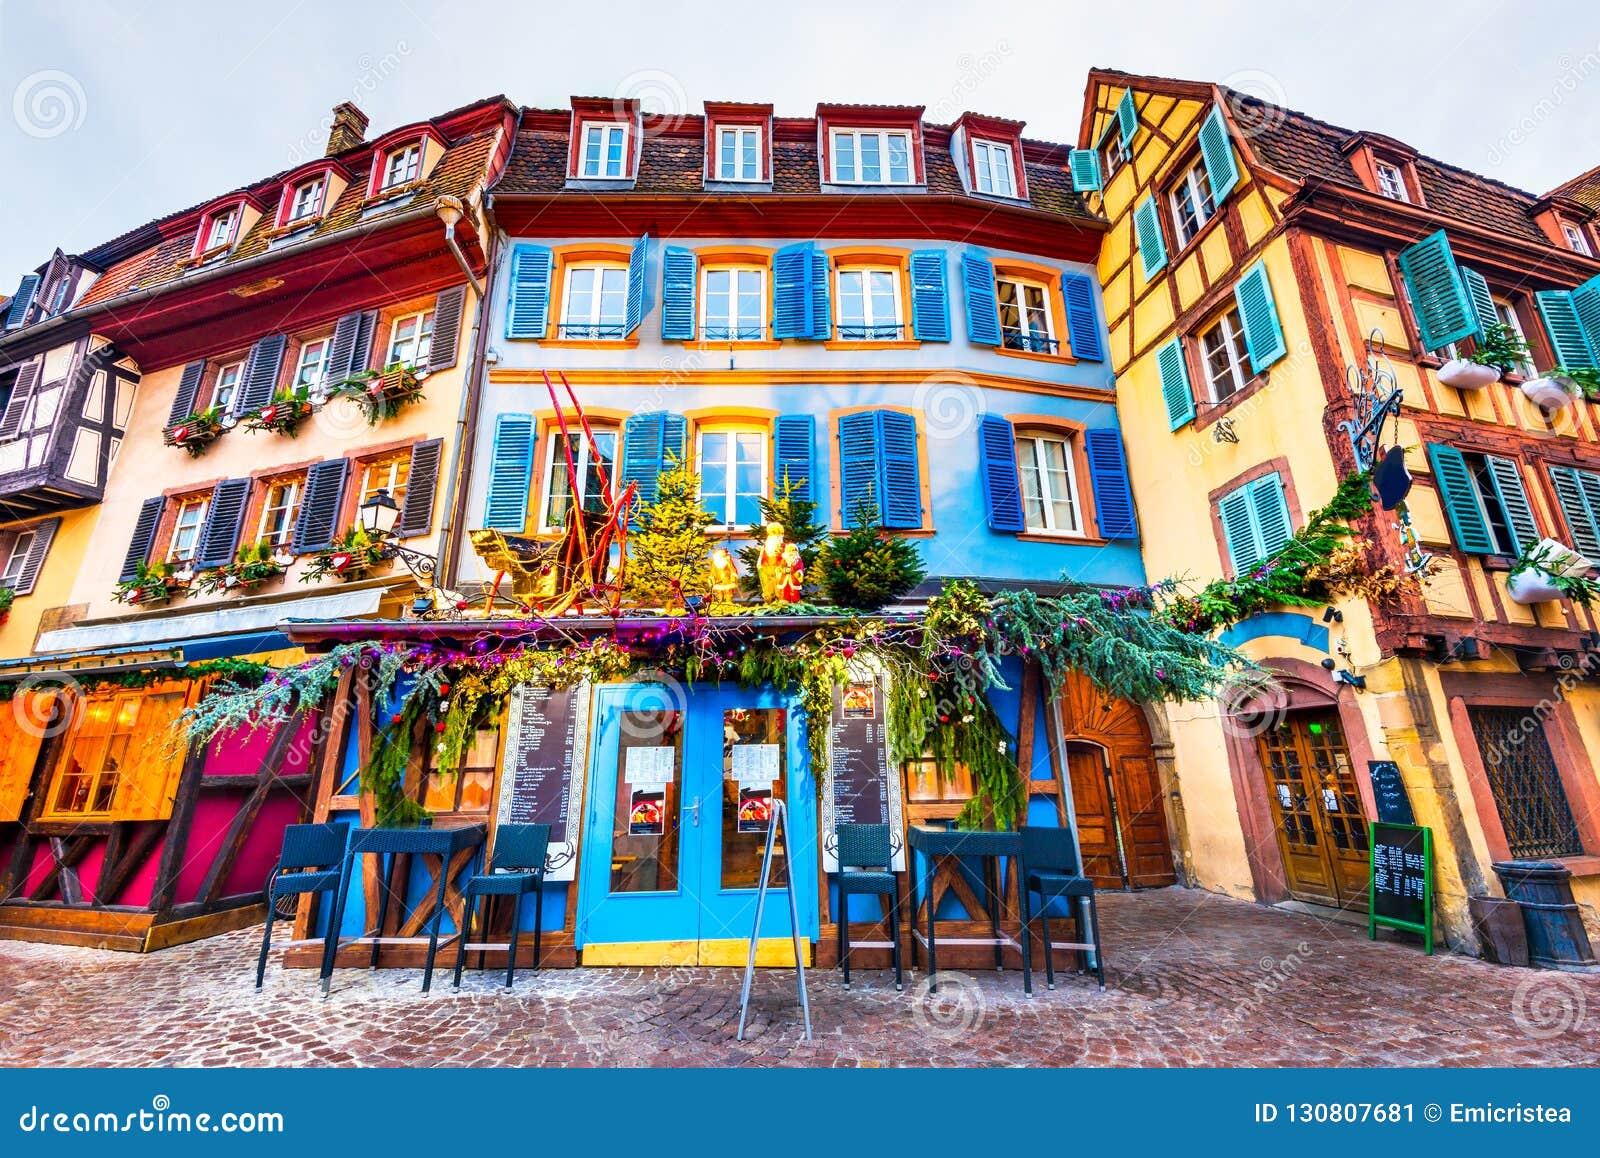 Colmar Christmas Market.Colmar Alsace France Little Venice Stock Image Image